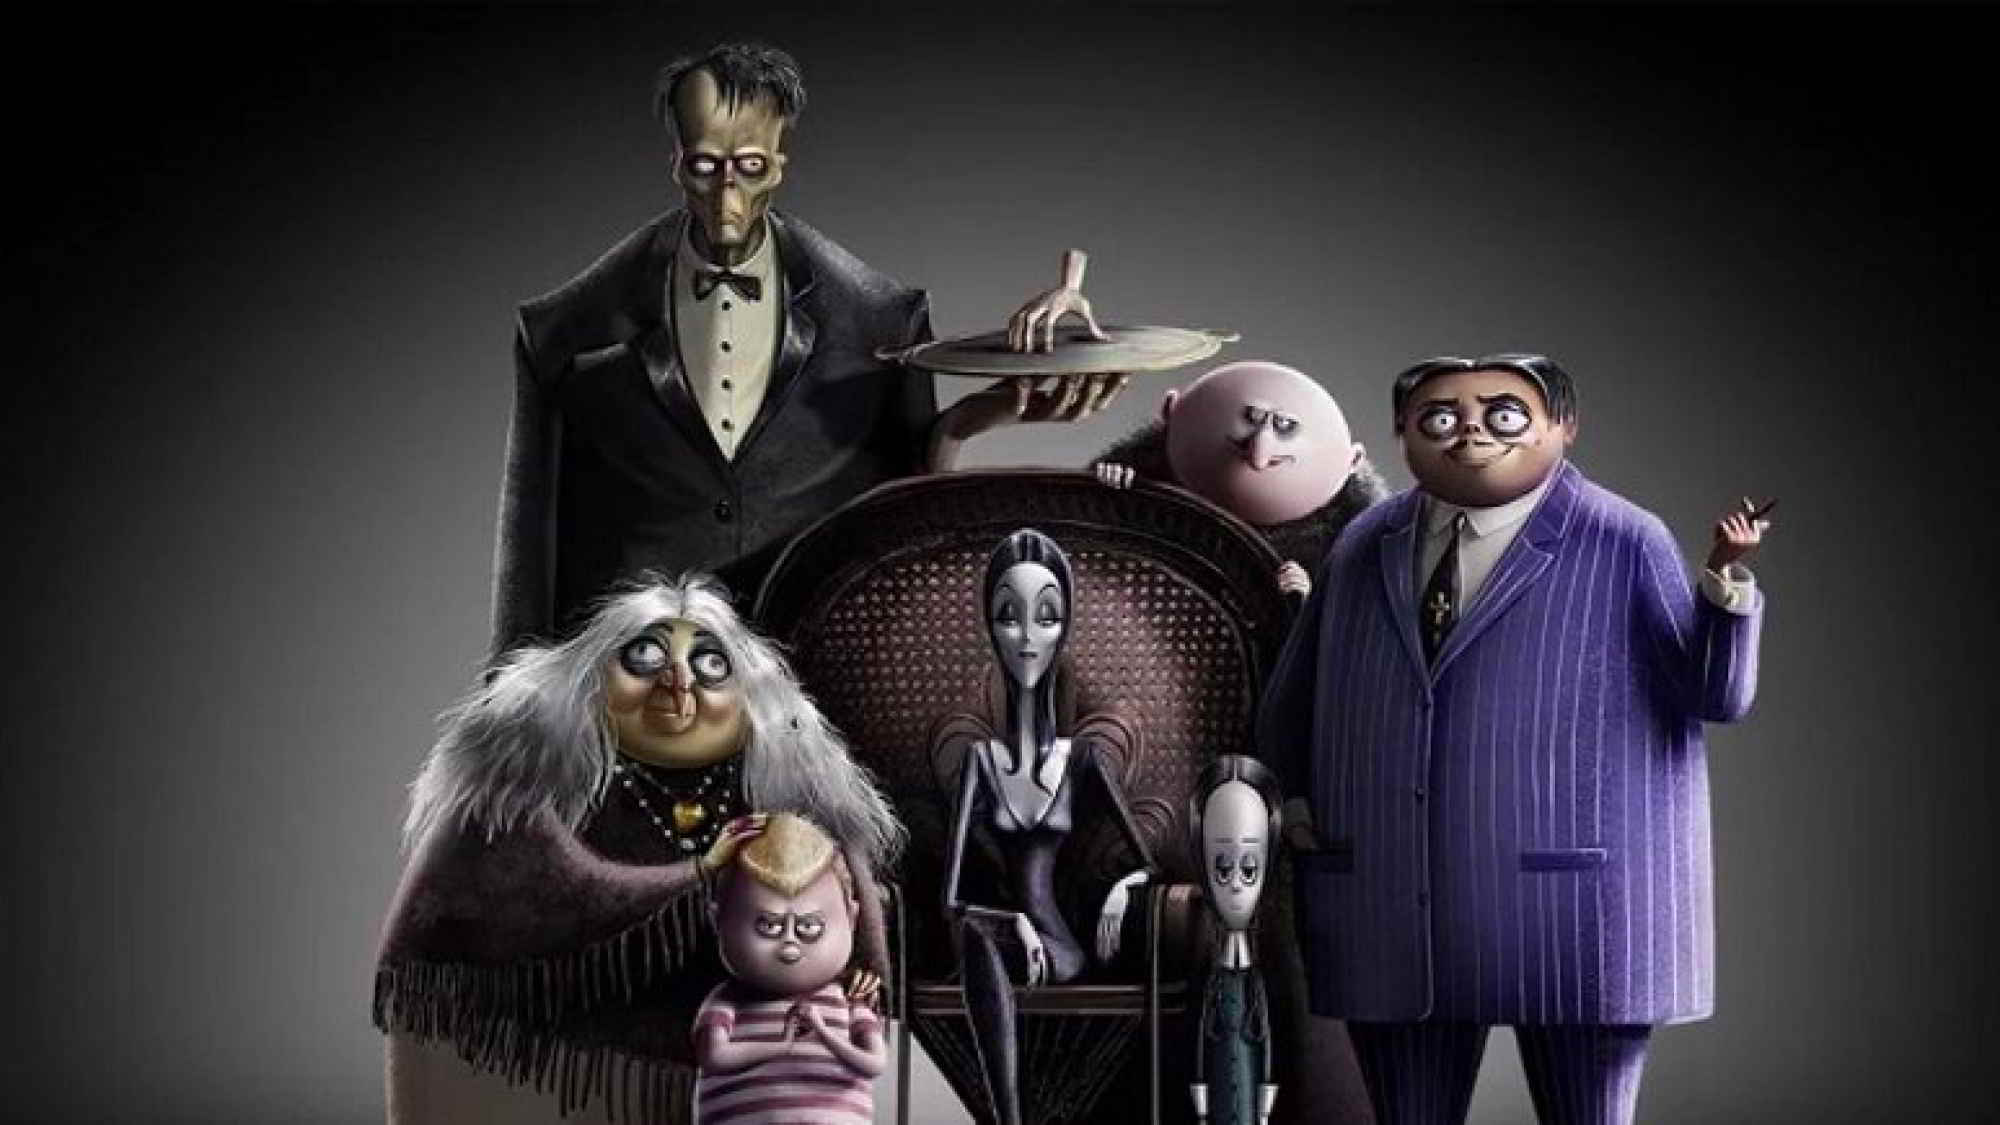 La Famiglia Addams al cinema ad Halloween